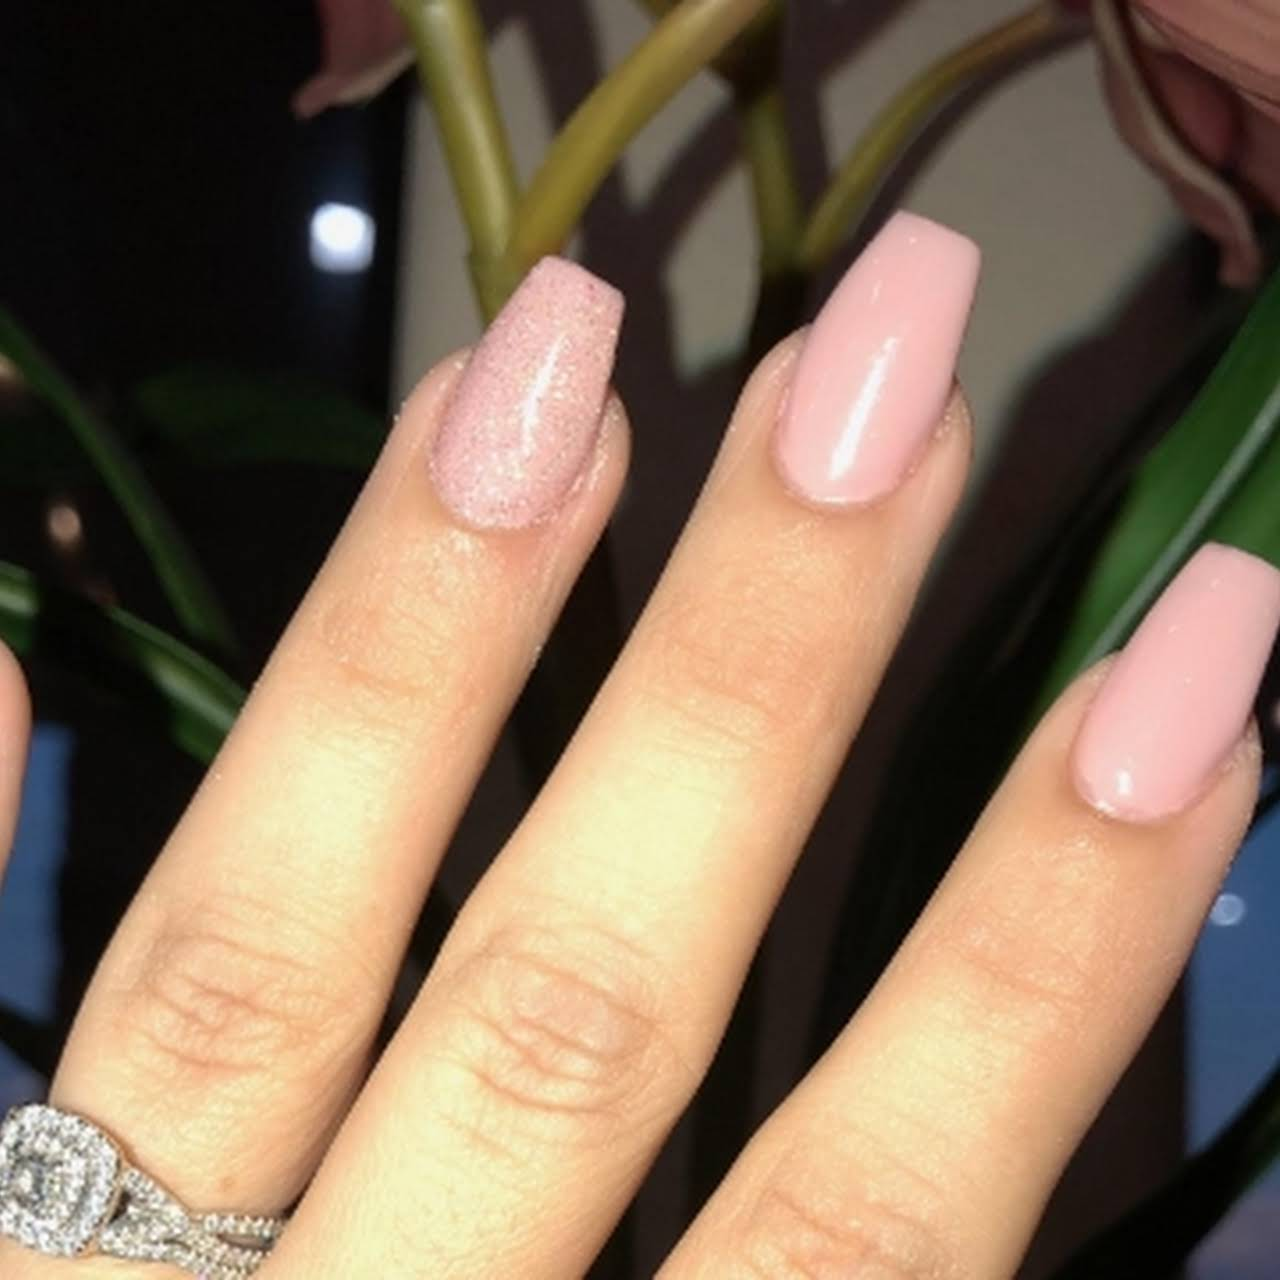 Enjoi Nails & Salon - Nail Salon in Chandler